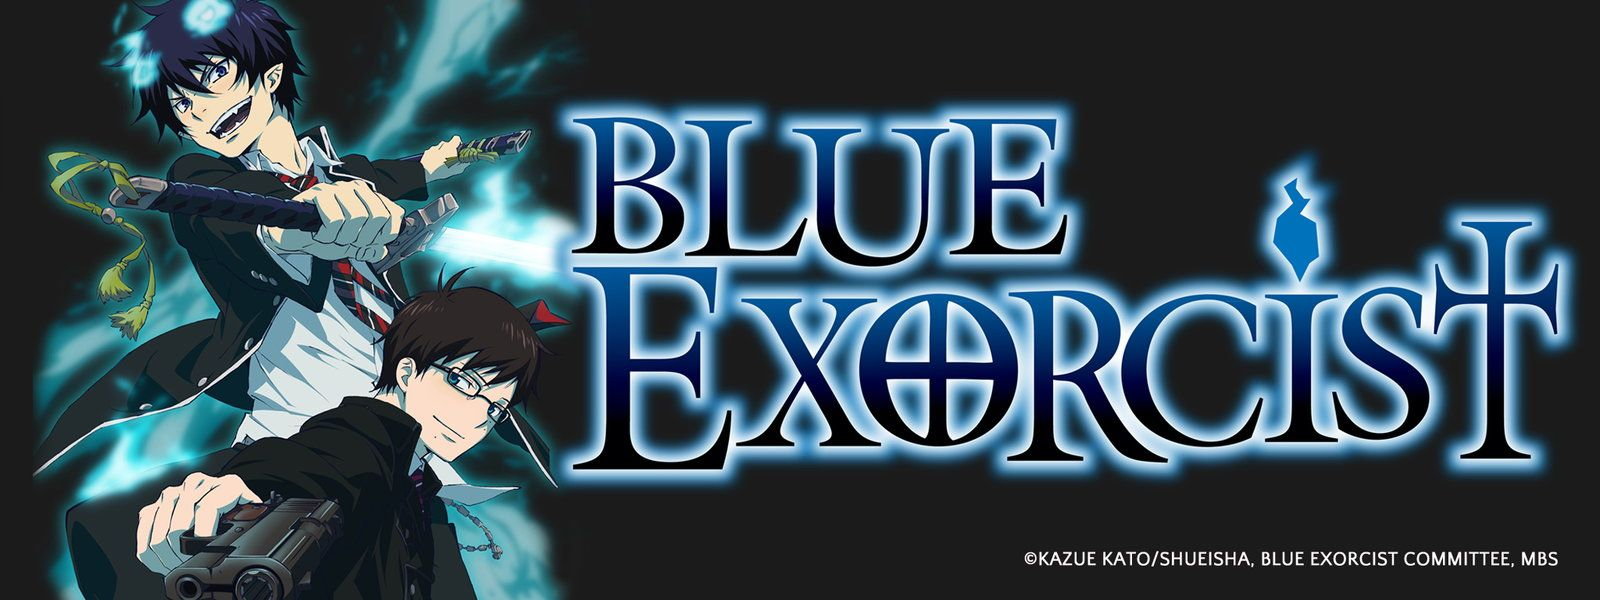 Blue exorcist blue exorcist online streaming blue